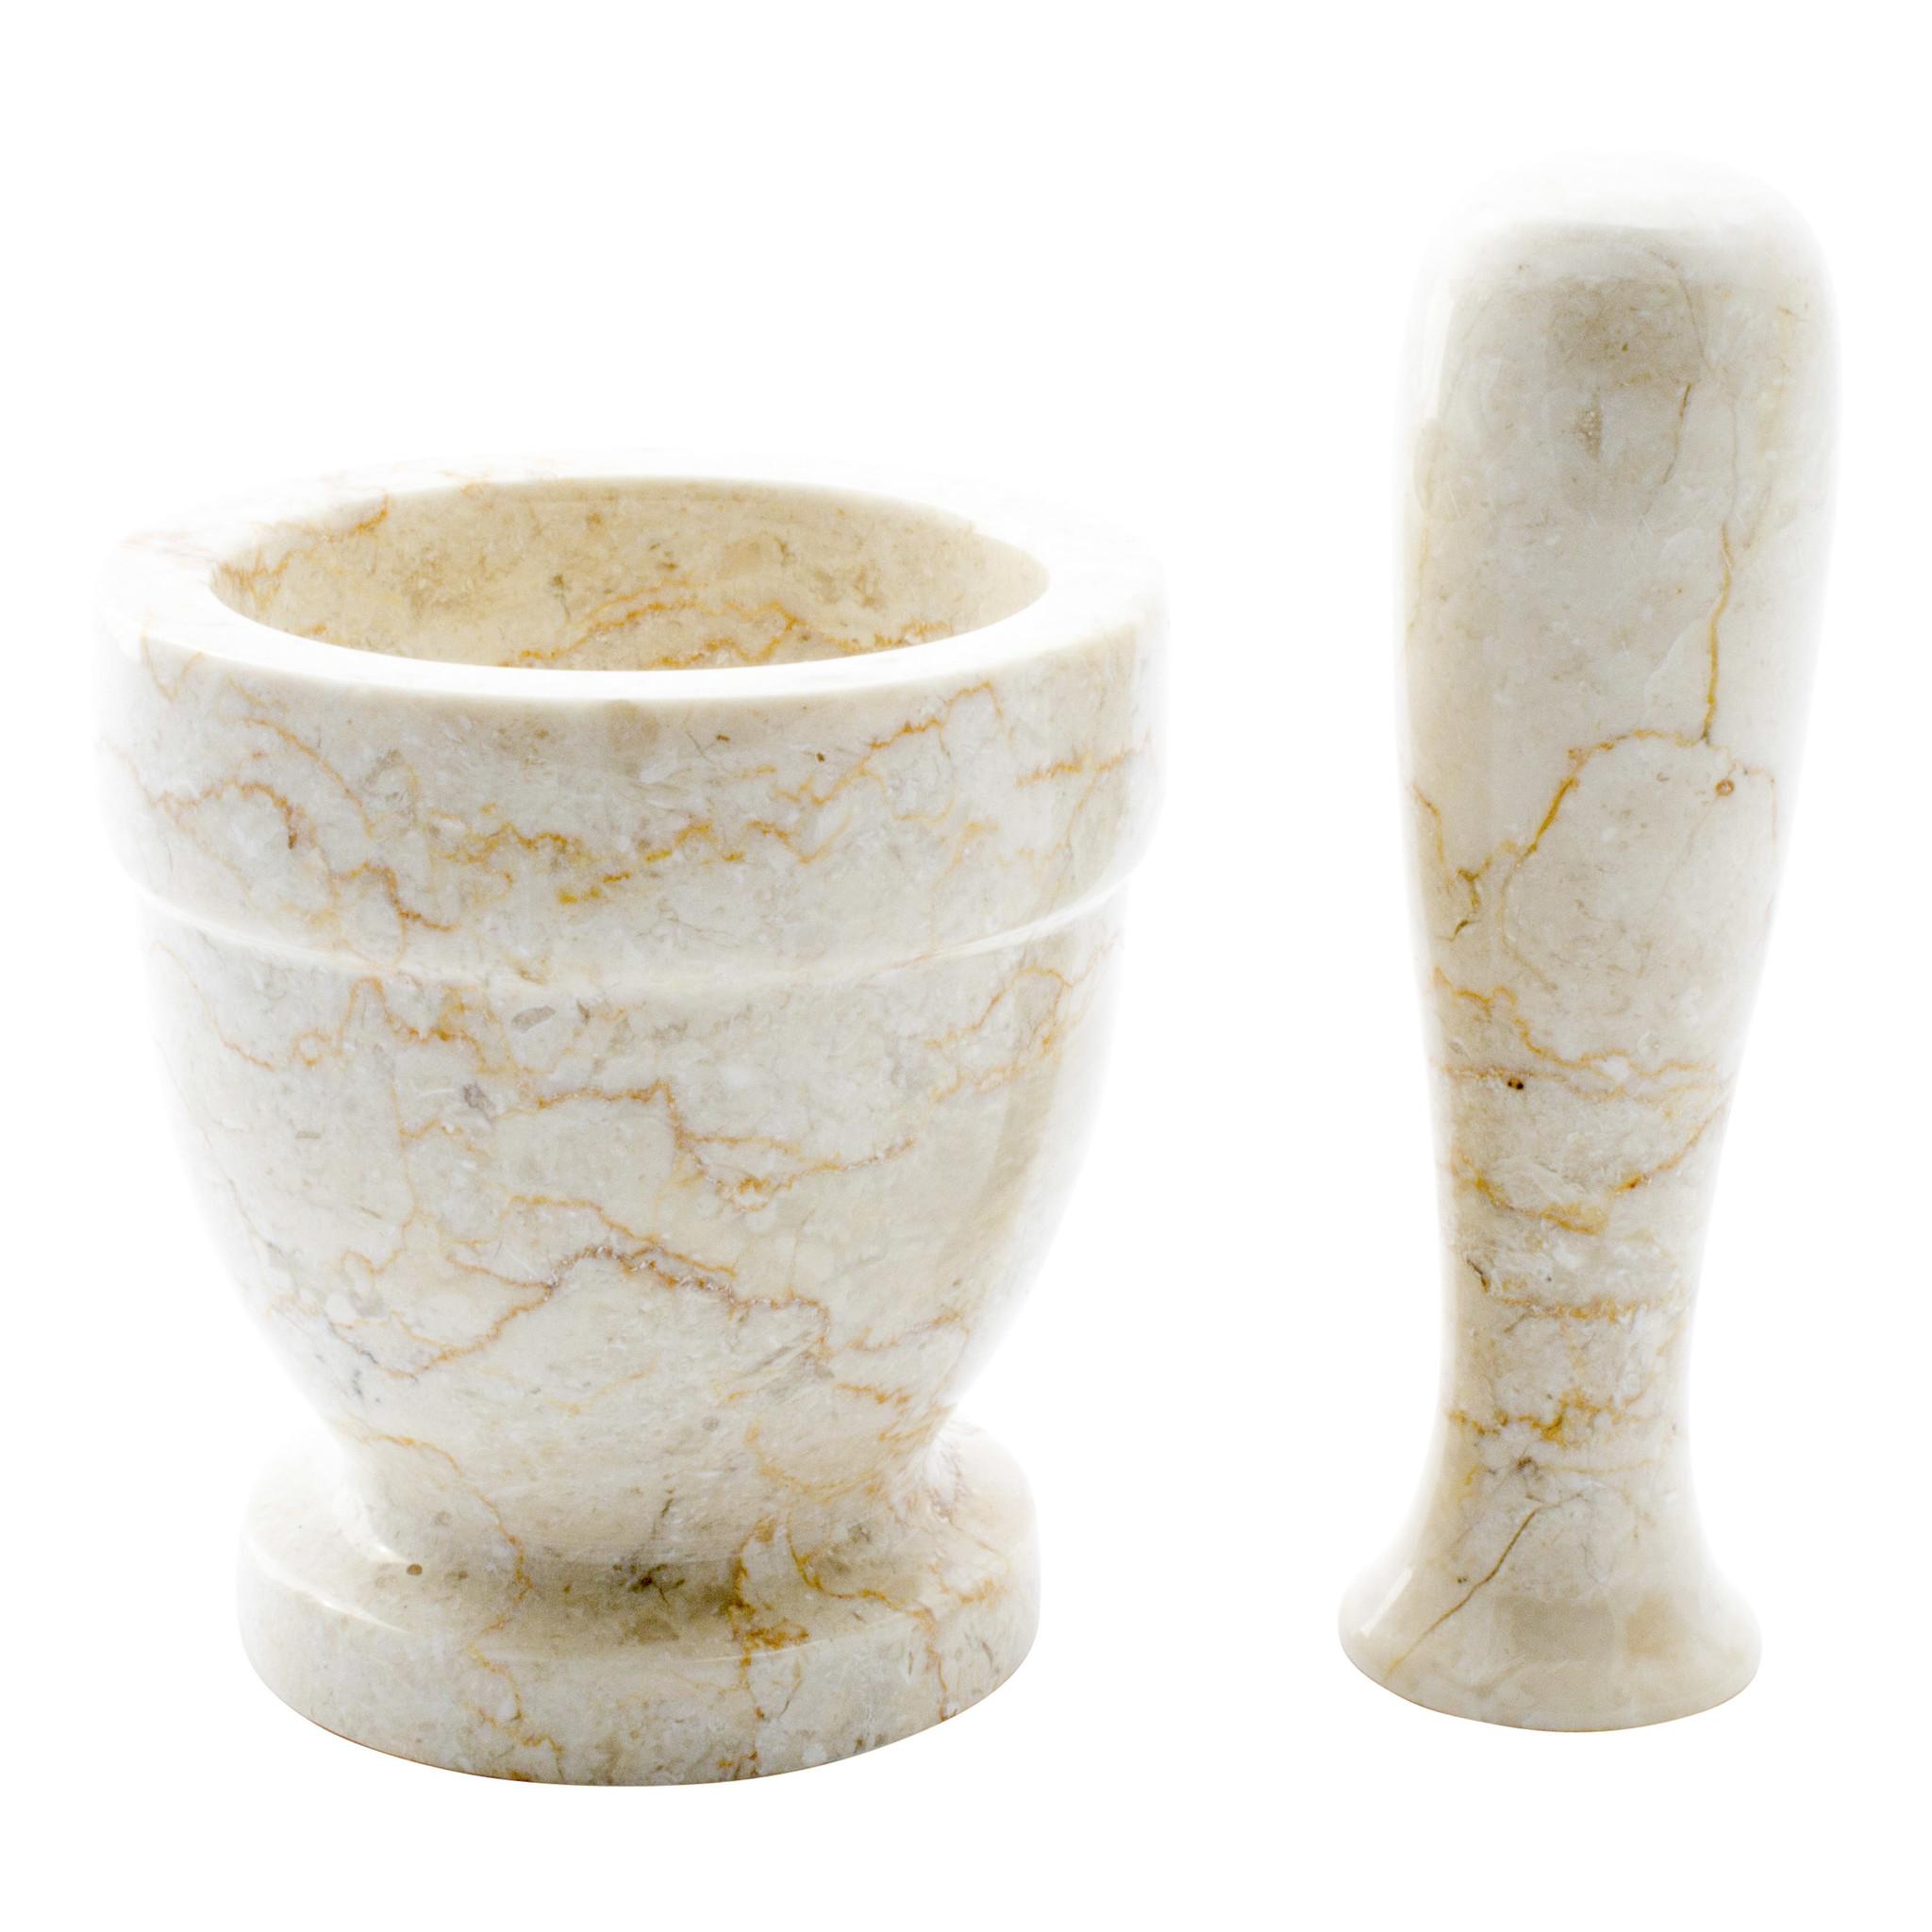 Indomarmer Cream Marble Mortar